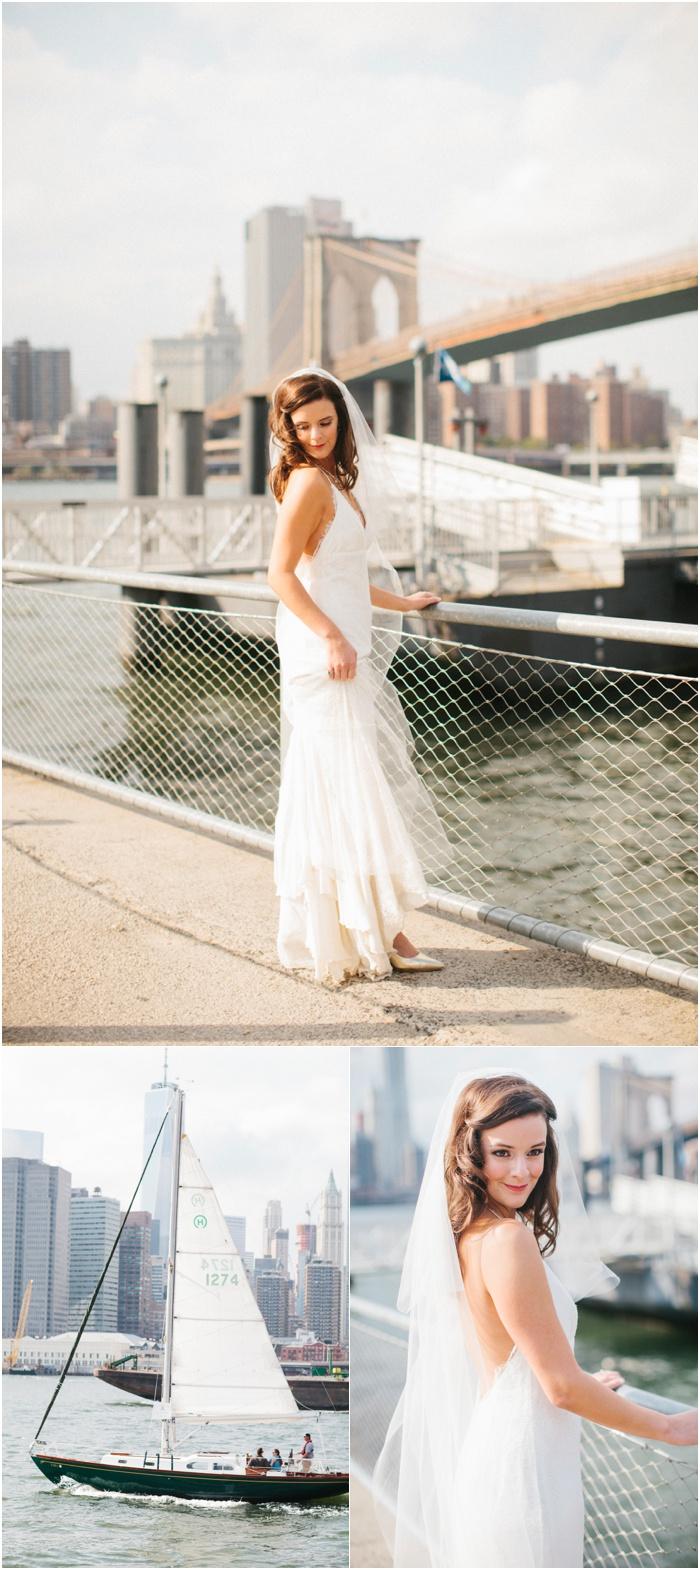 05_new york wedding photographer.jpeg